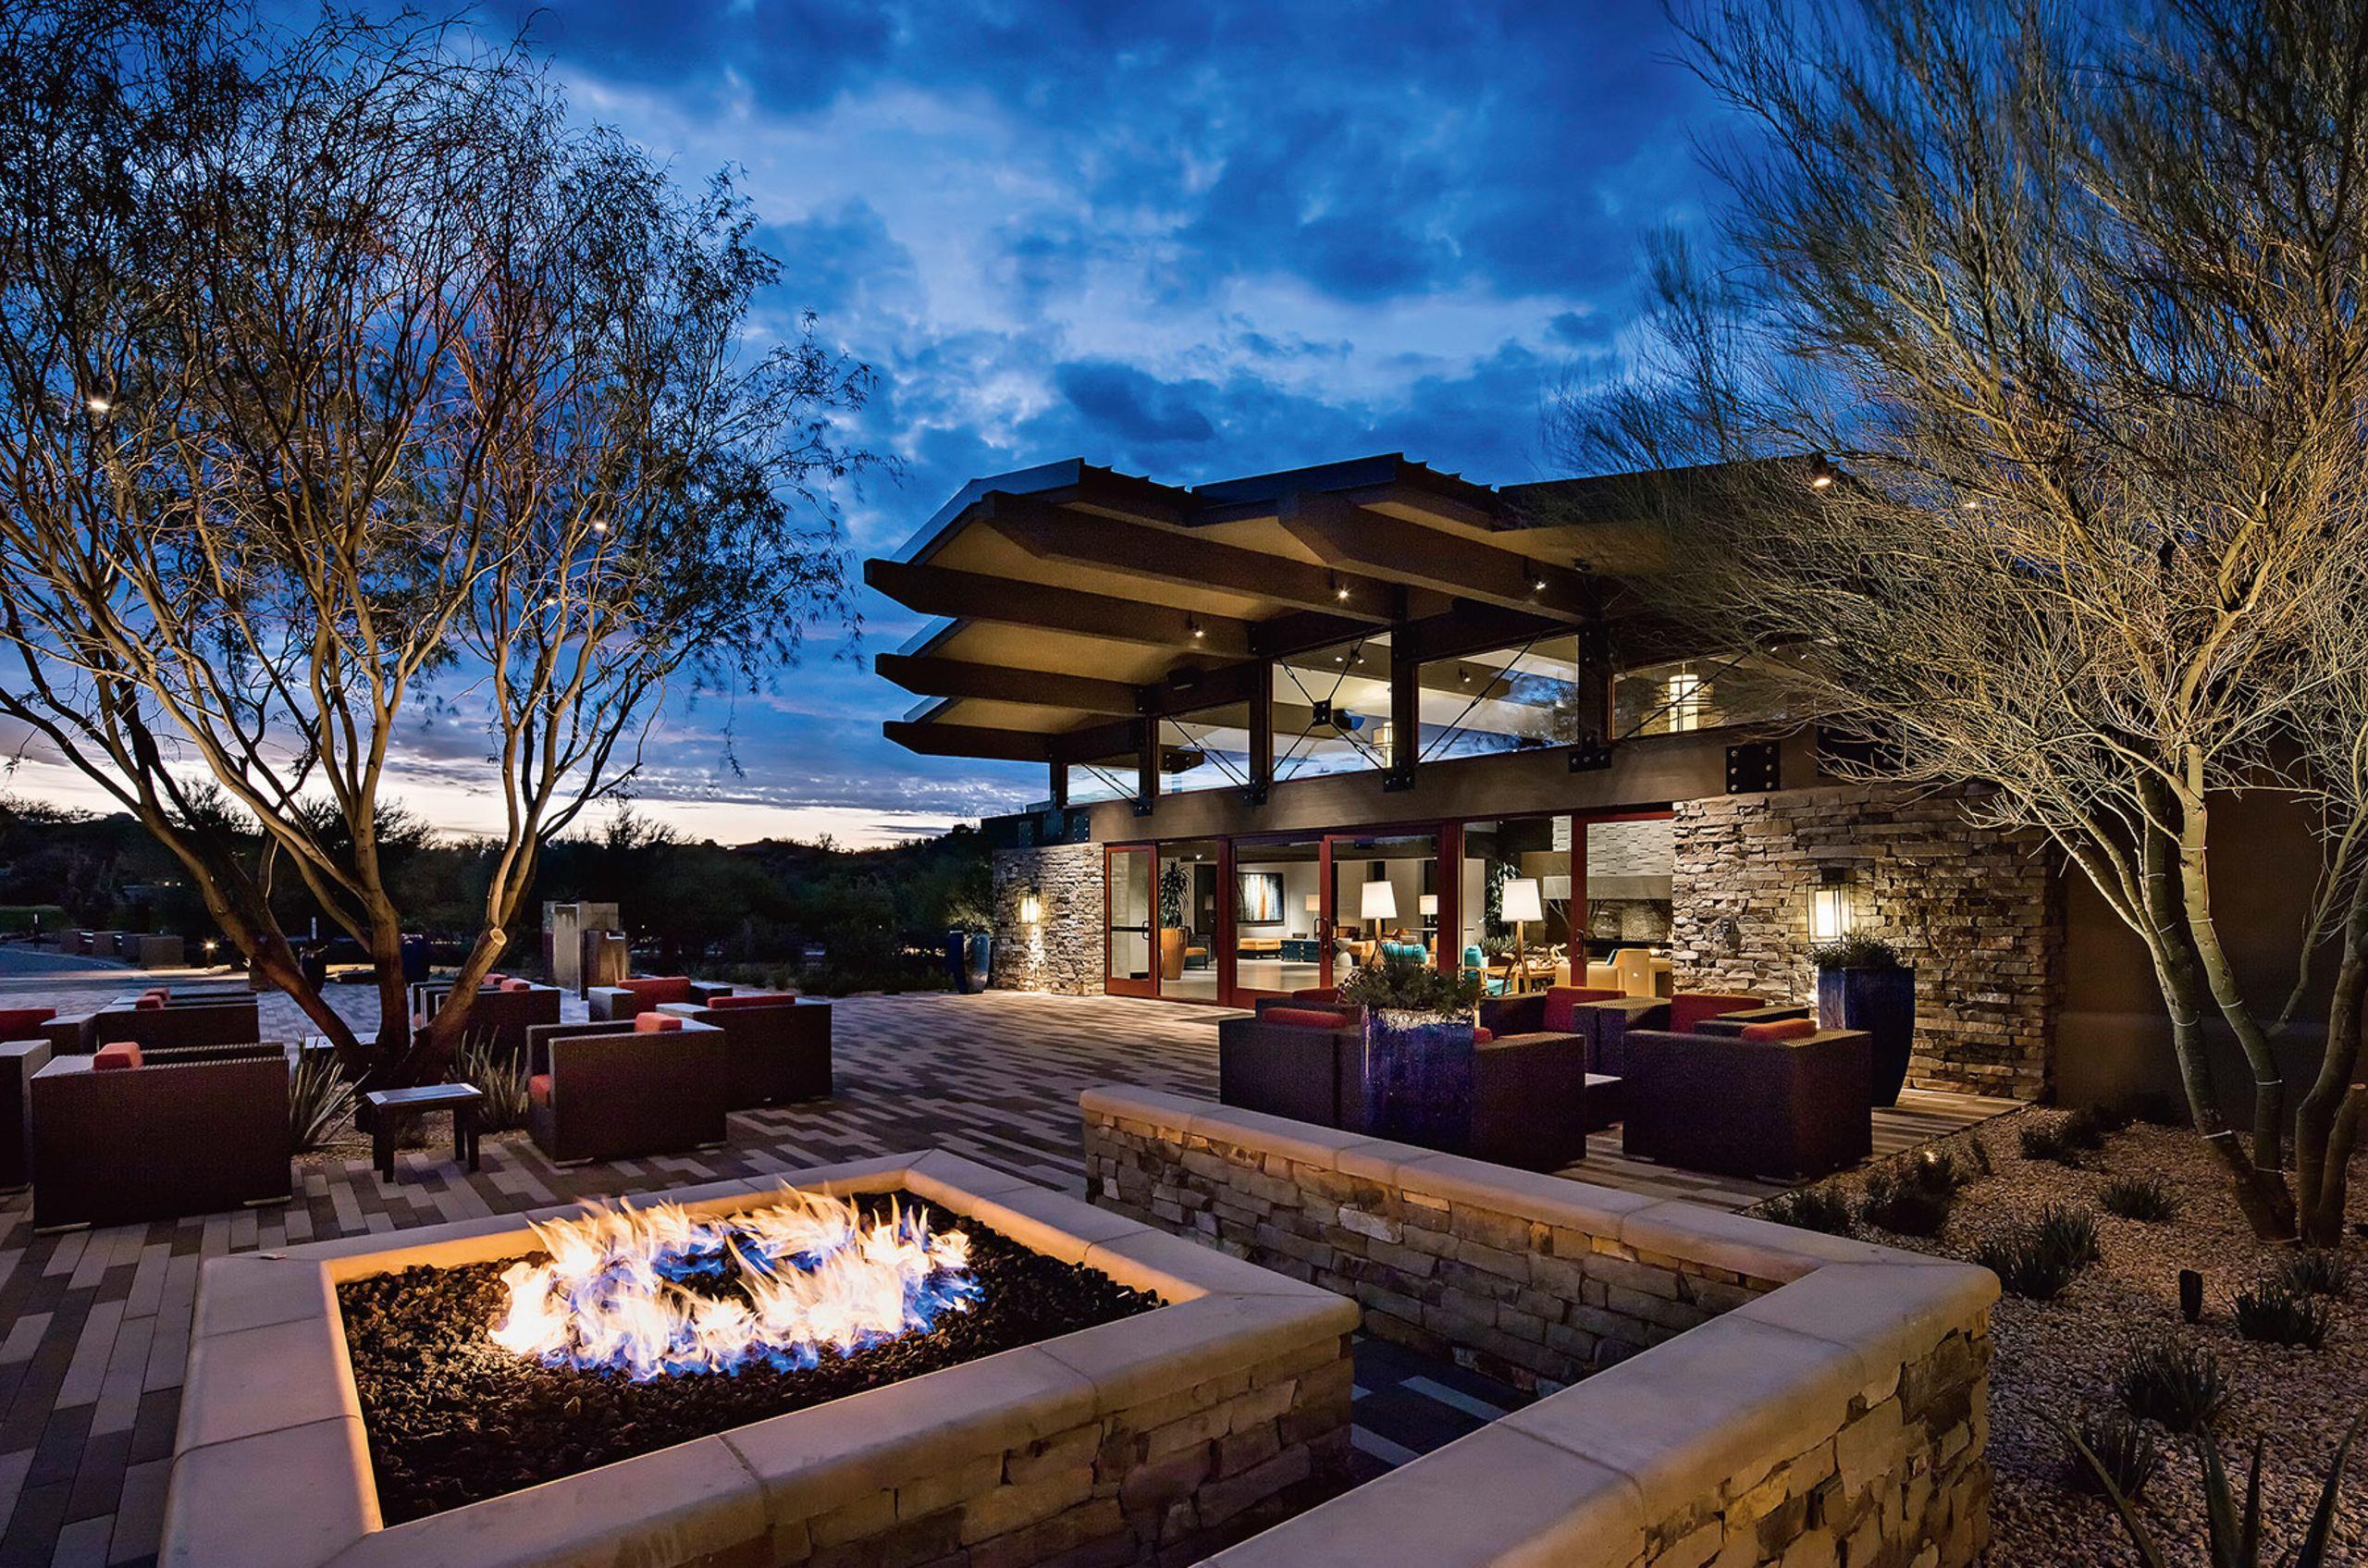 Sonoran health Spa at Desert Mountain